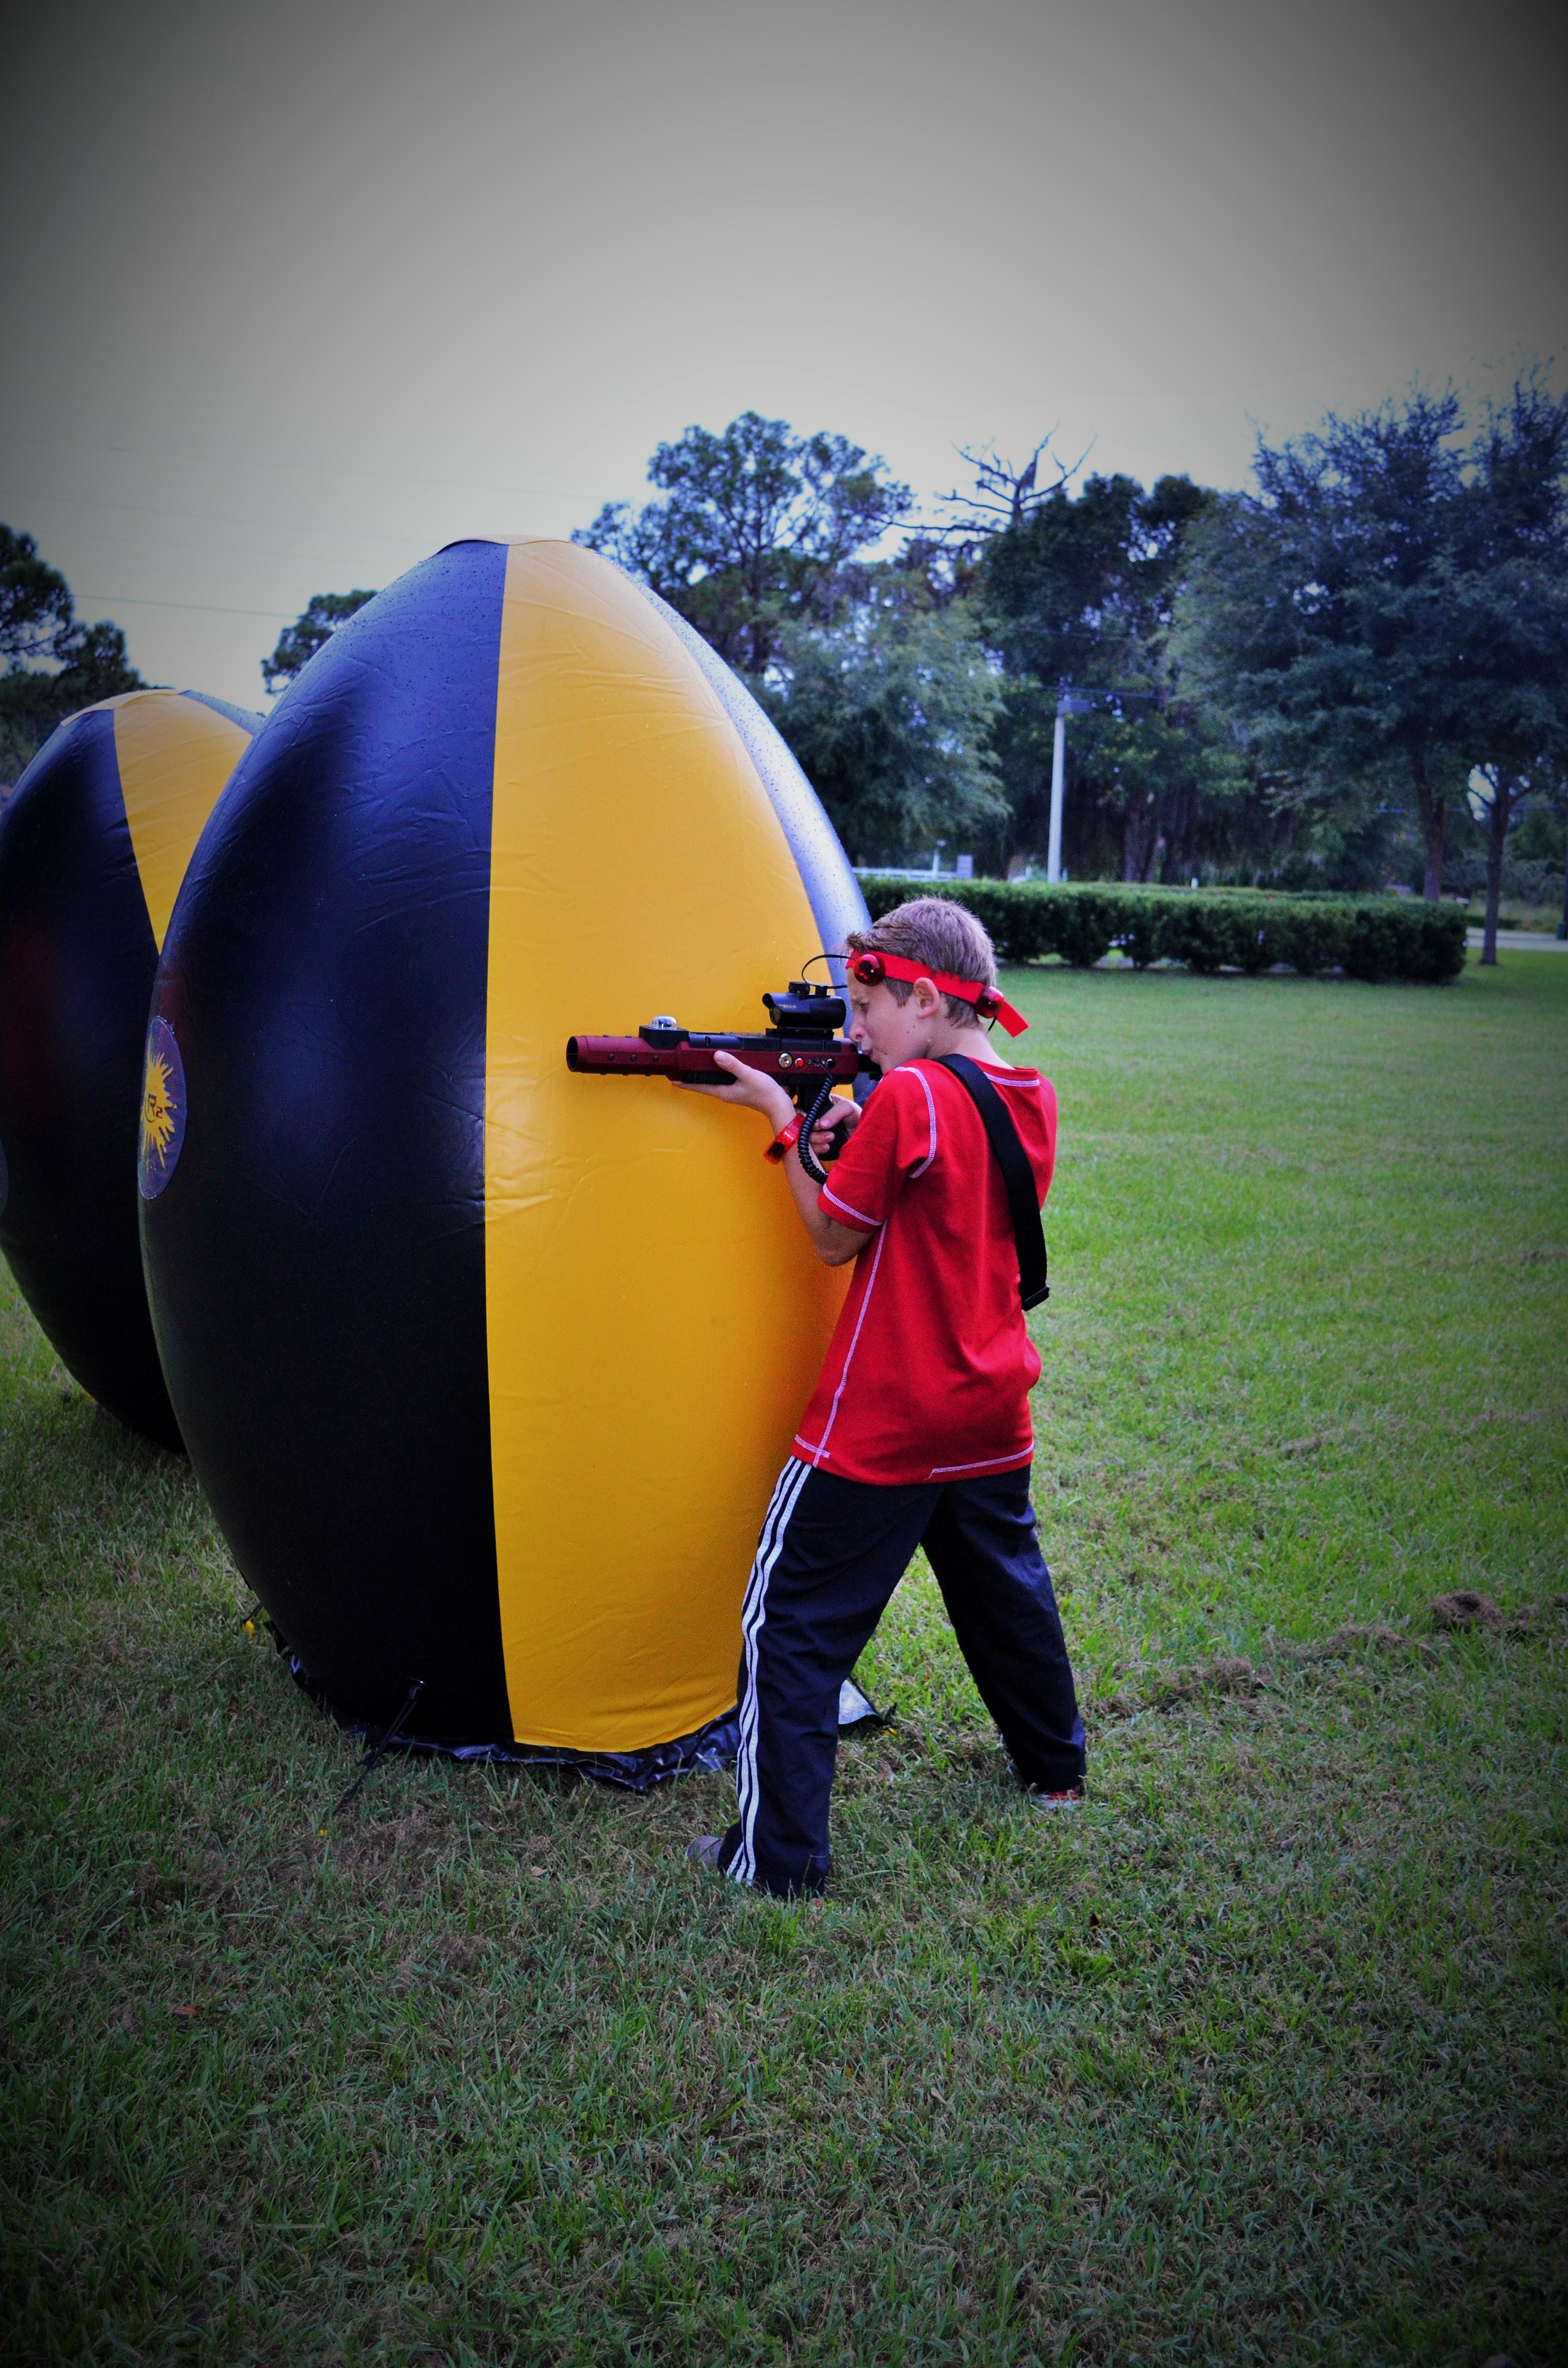 Amusement Places in Lehigh Acres, FL